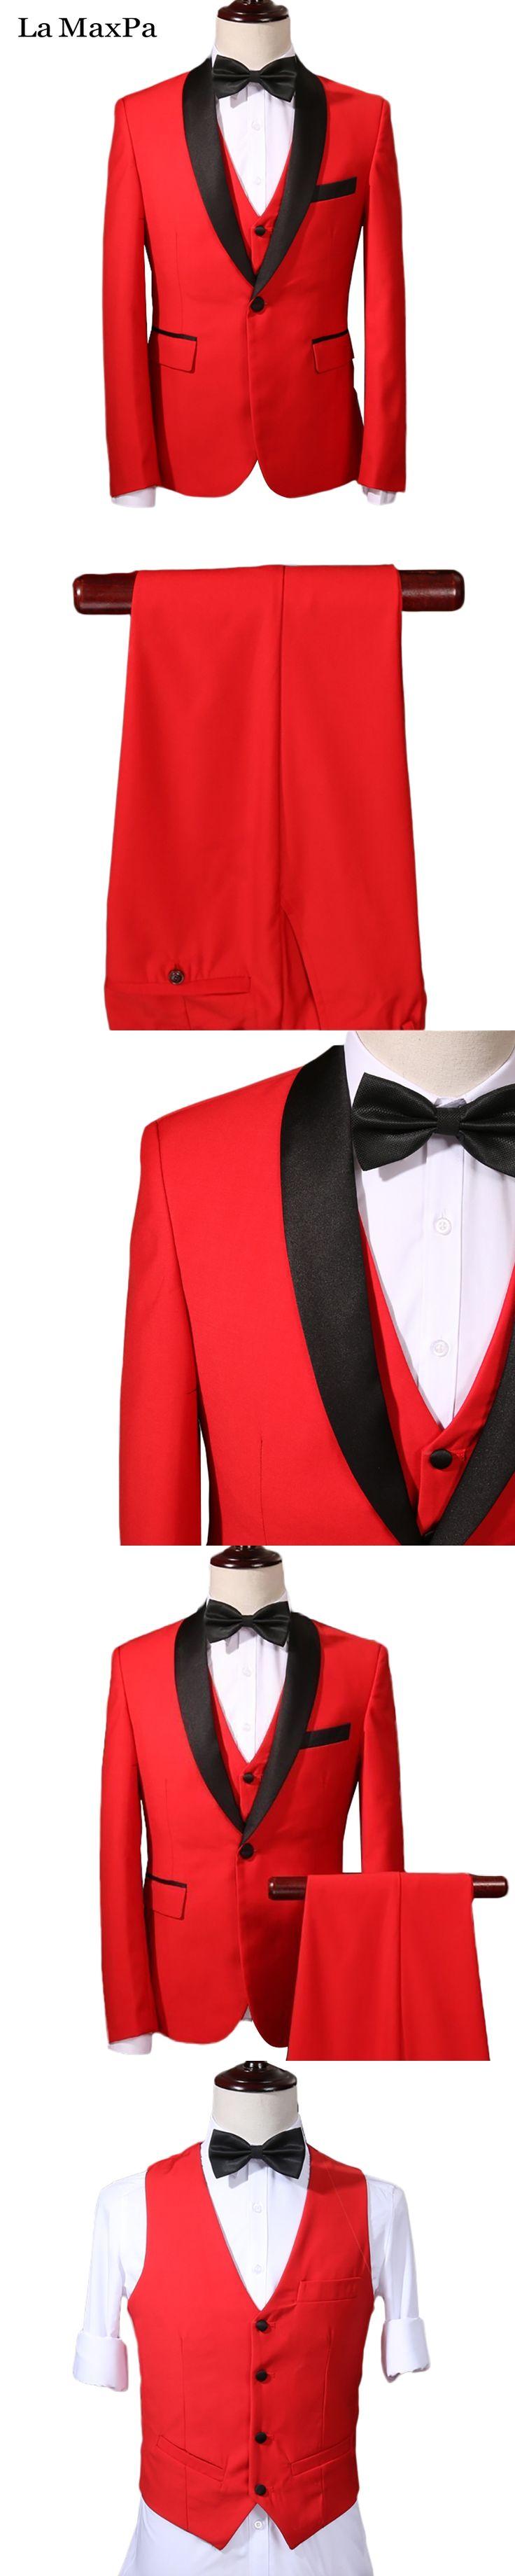 La MaxPa (jacket+pants+vest) 2017 New brand custom made men suit wool wedding suit for man slim fit prom party red business suit